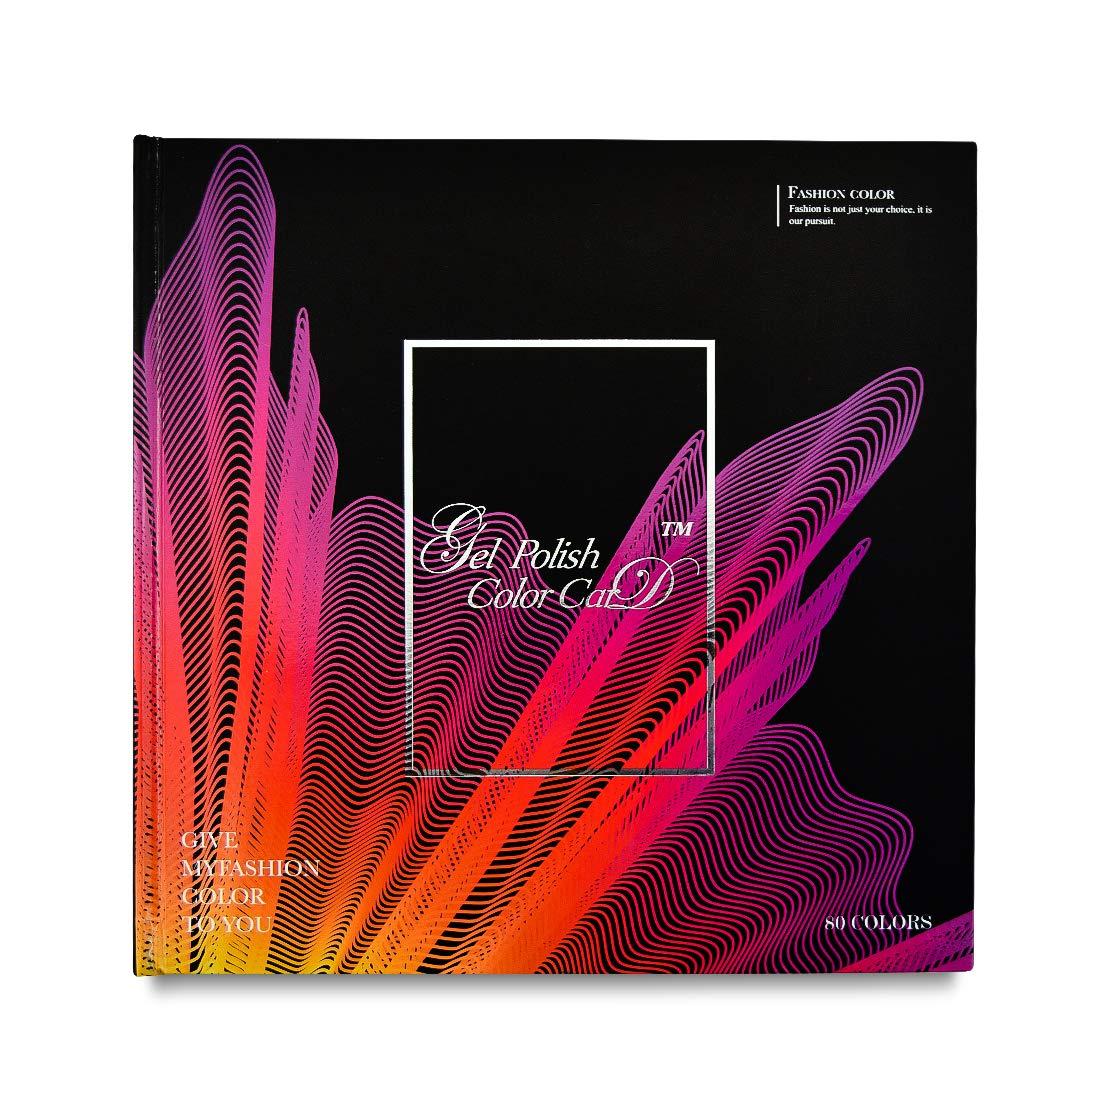 Pro 80 Colors Photo Album Oval Flat Tips Design Printed Pattern Nail Gel Polish Display Card Book Chart for Nail Art Salon, HJ-NDB026